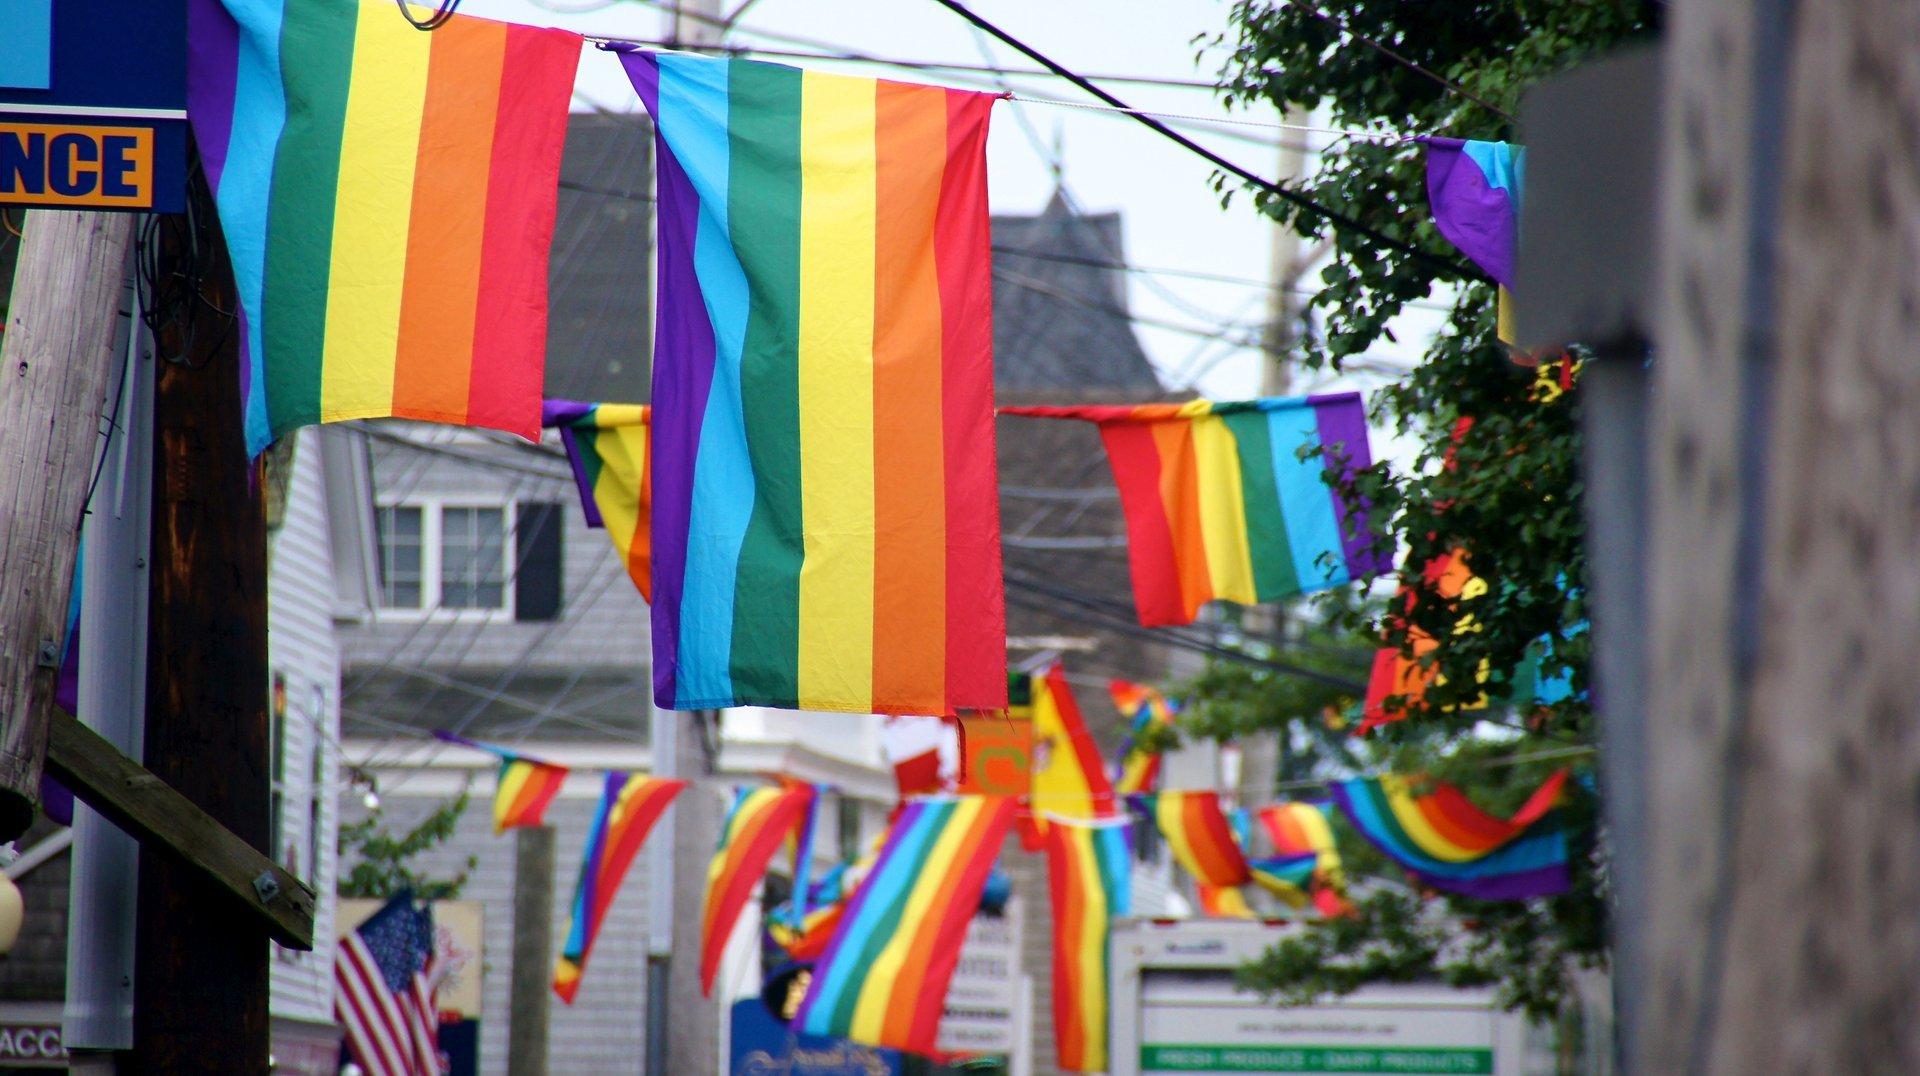 Provincetown Carnival Week in Massachusetts 2019 - Best Time